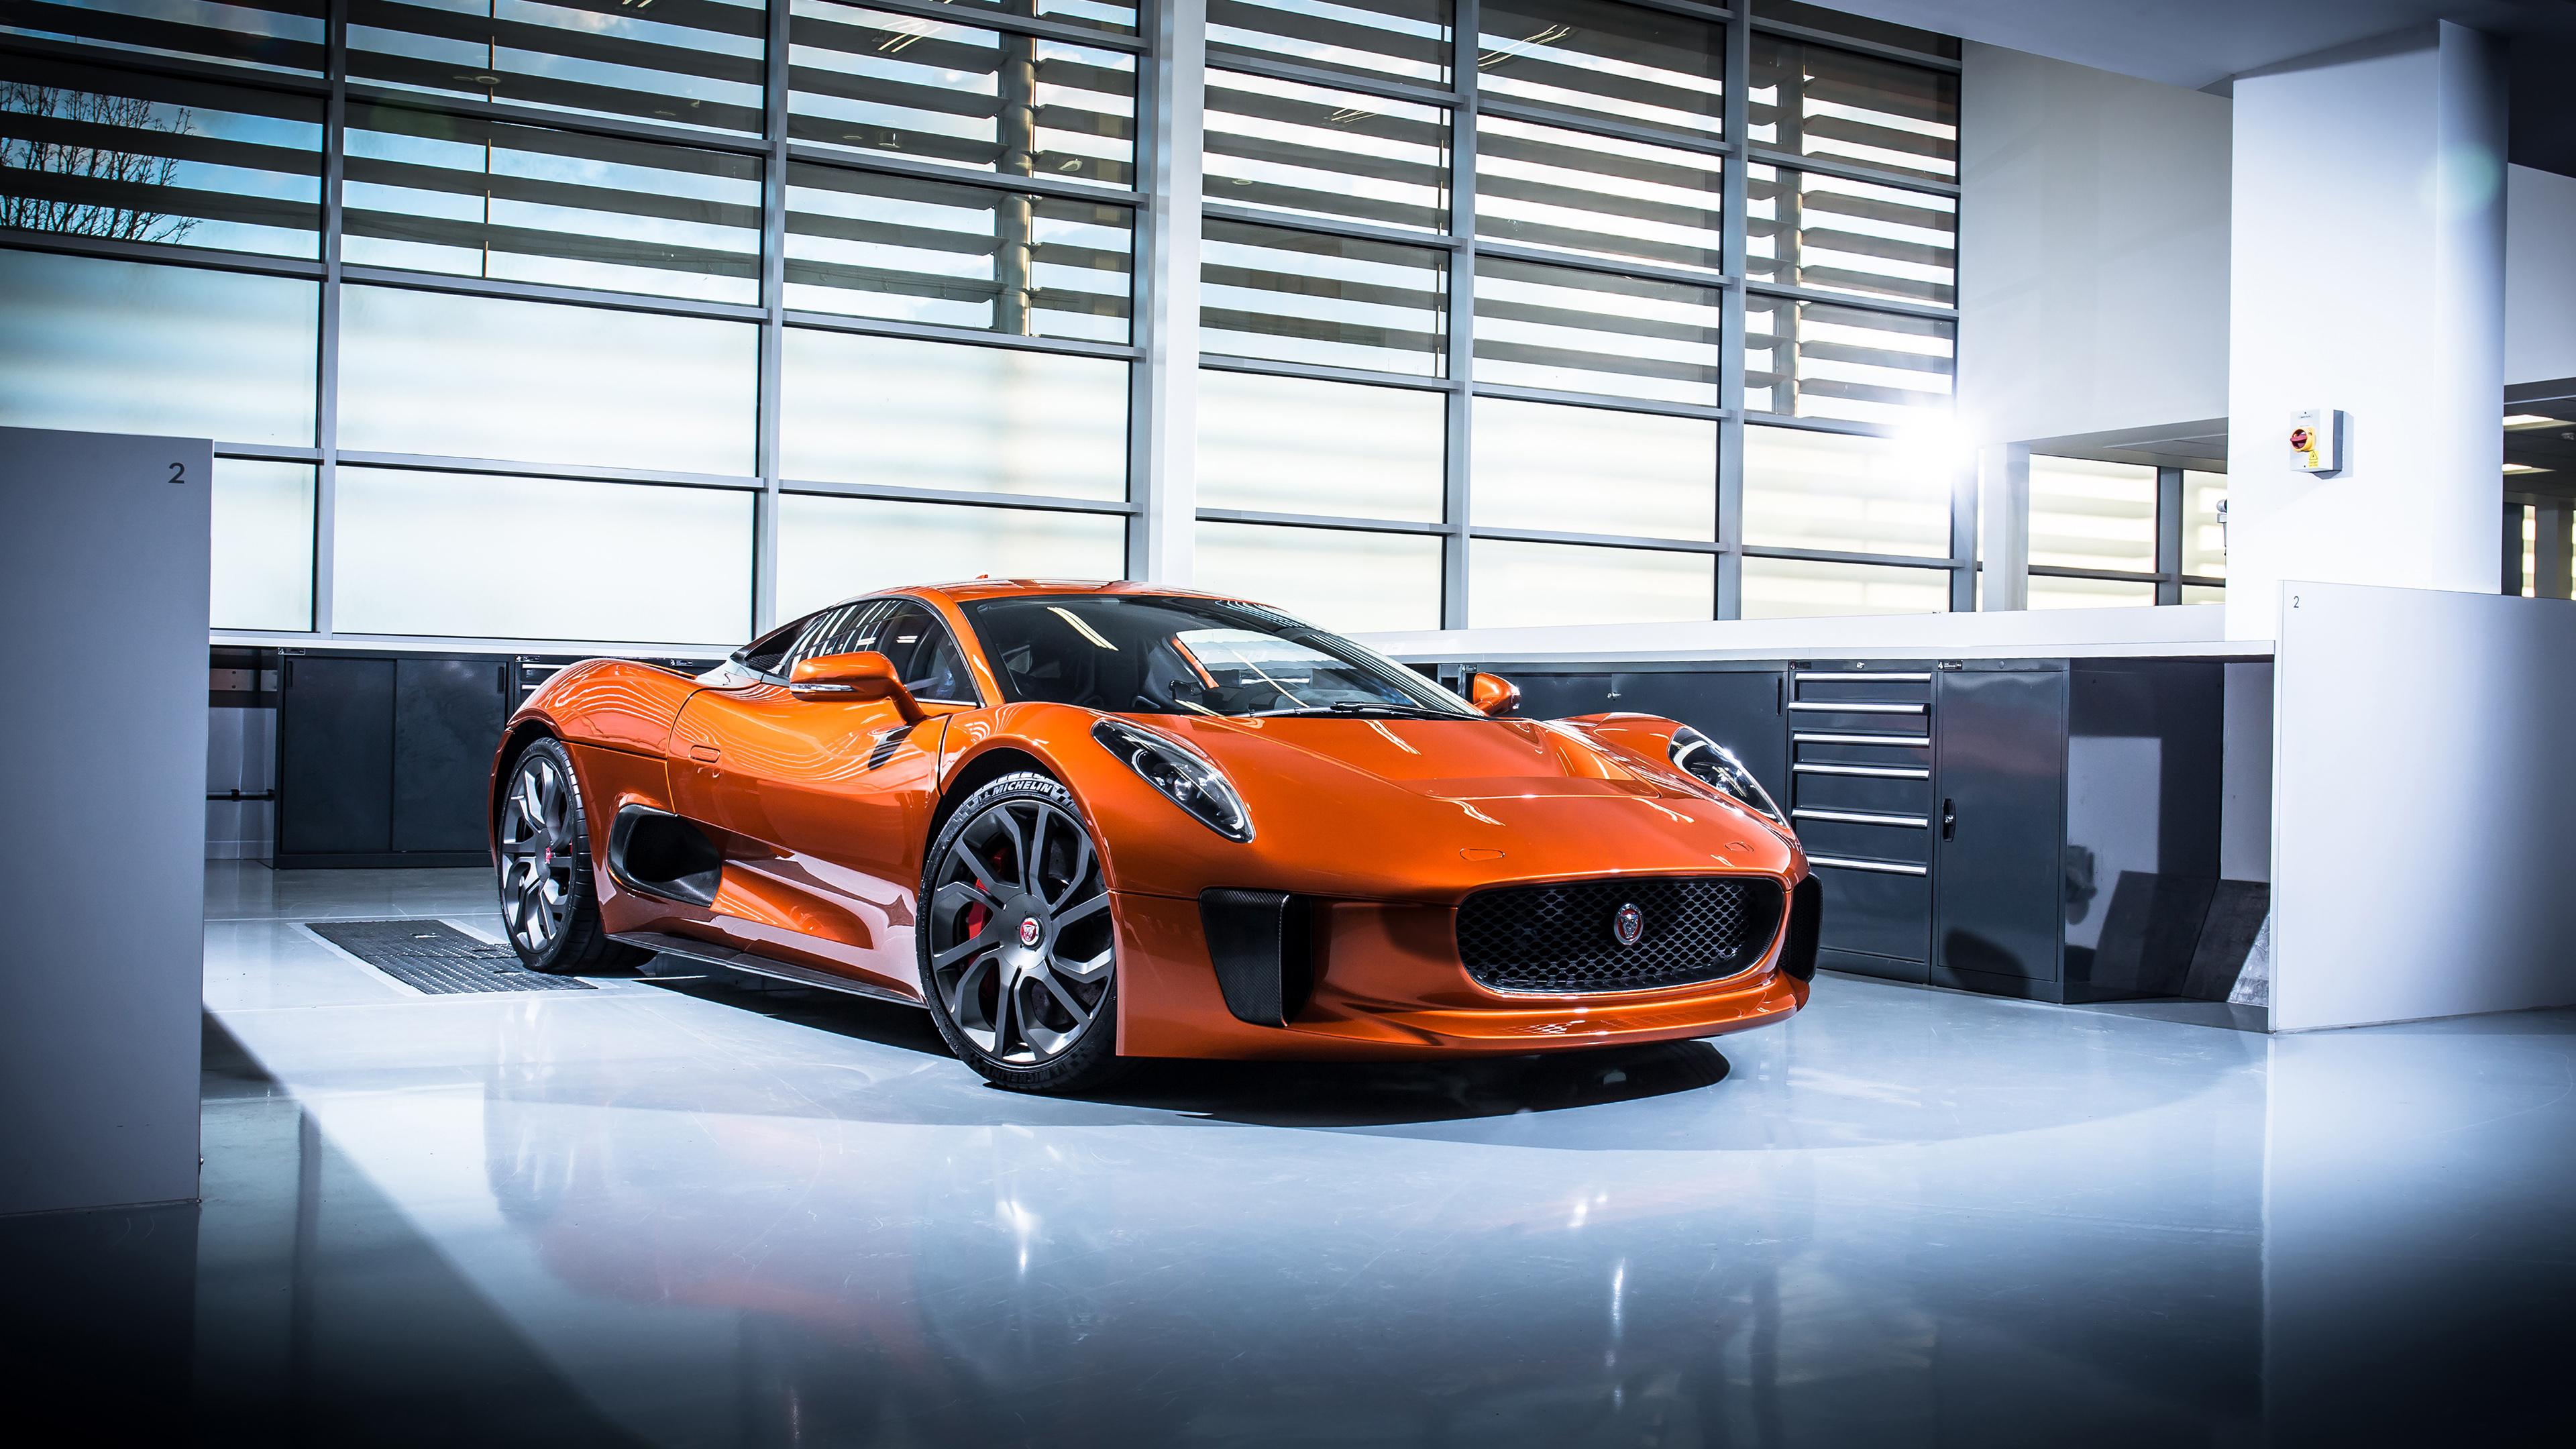 2015 Jaguar C X75 James Bond 007 Spectre James Bond